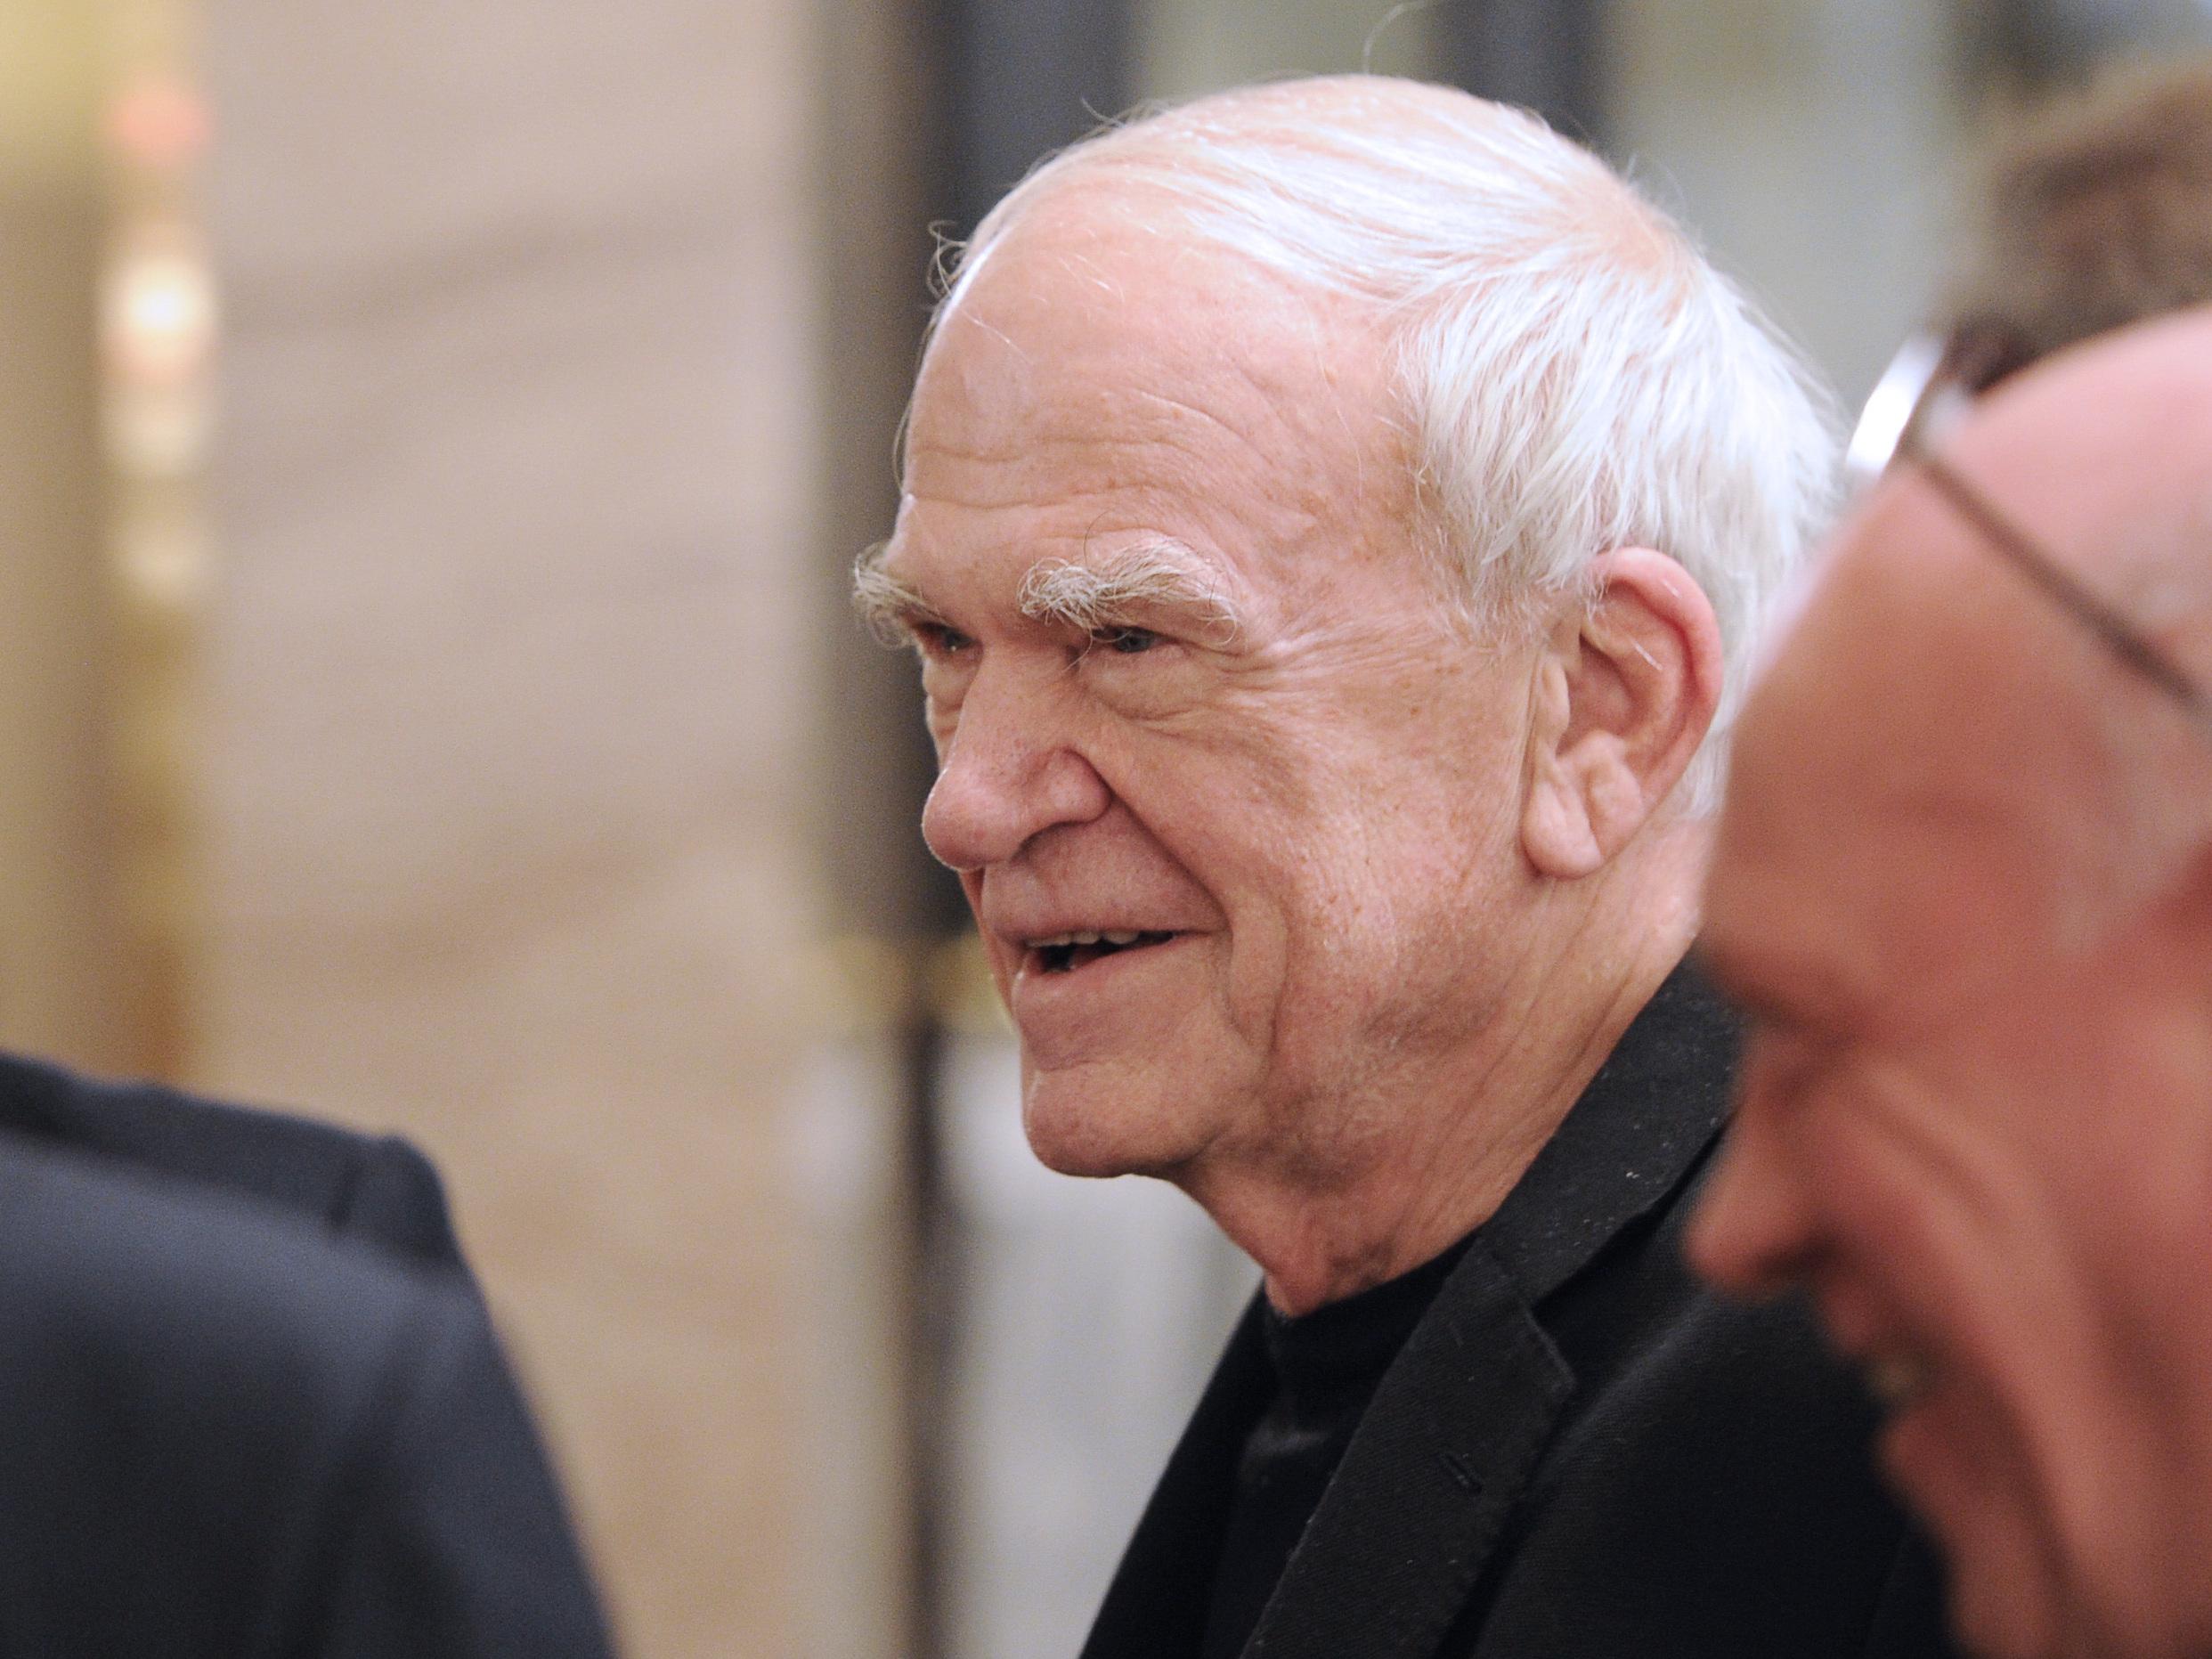 Milan Kundera's Czech Citizenship Is Restored After 40 Years